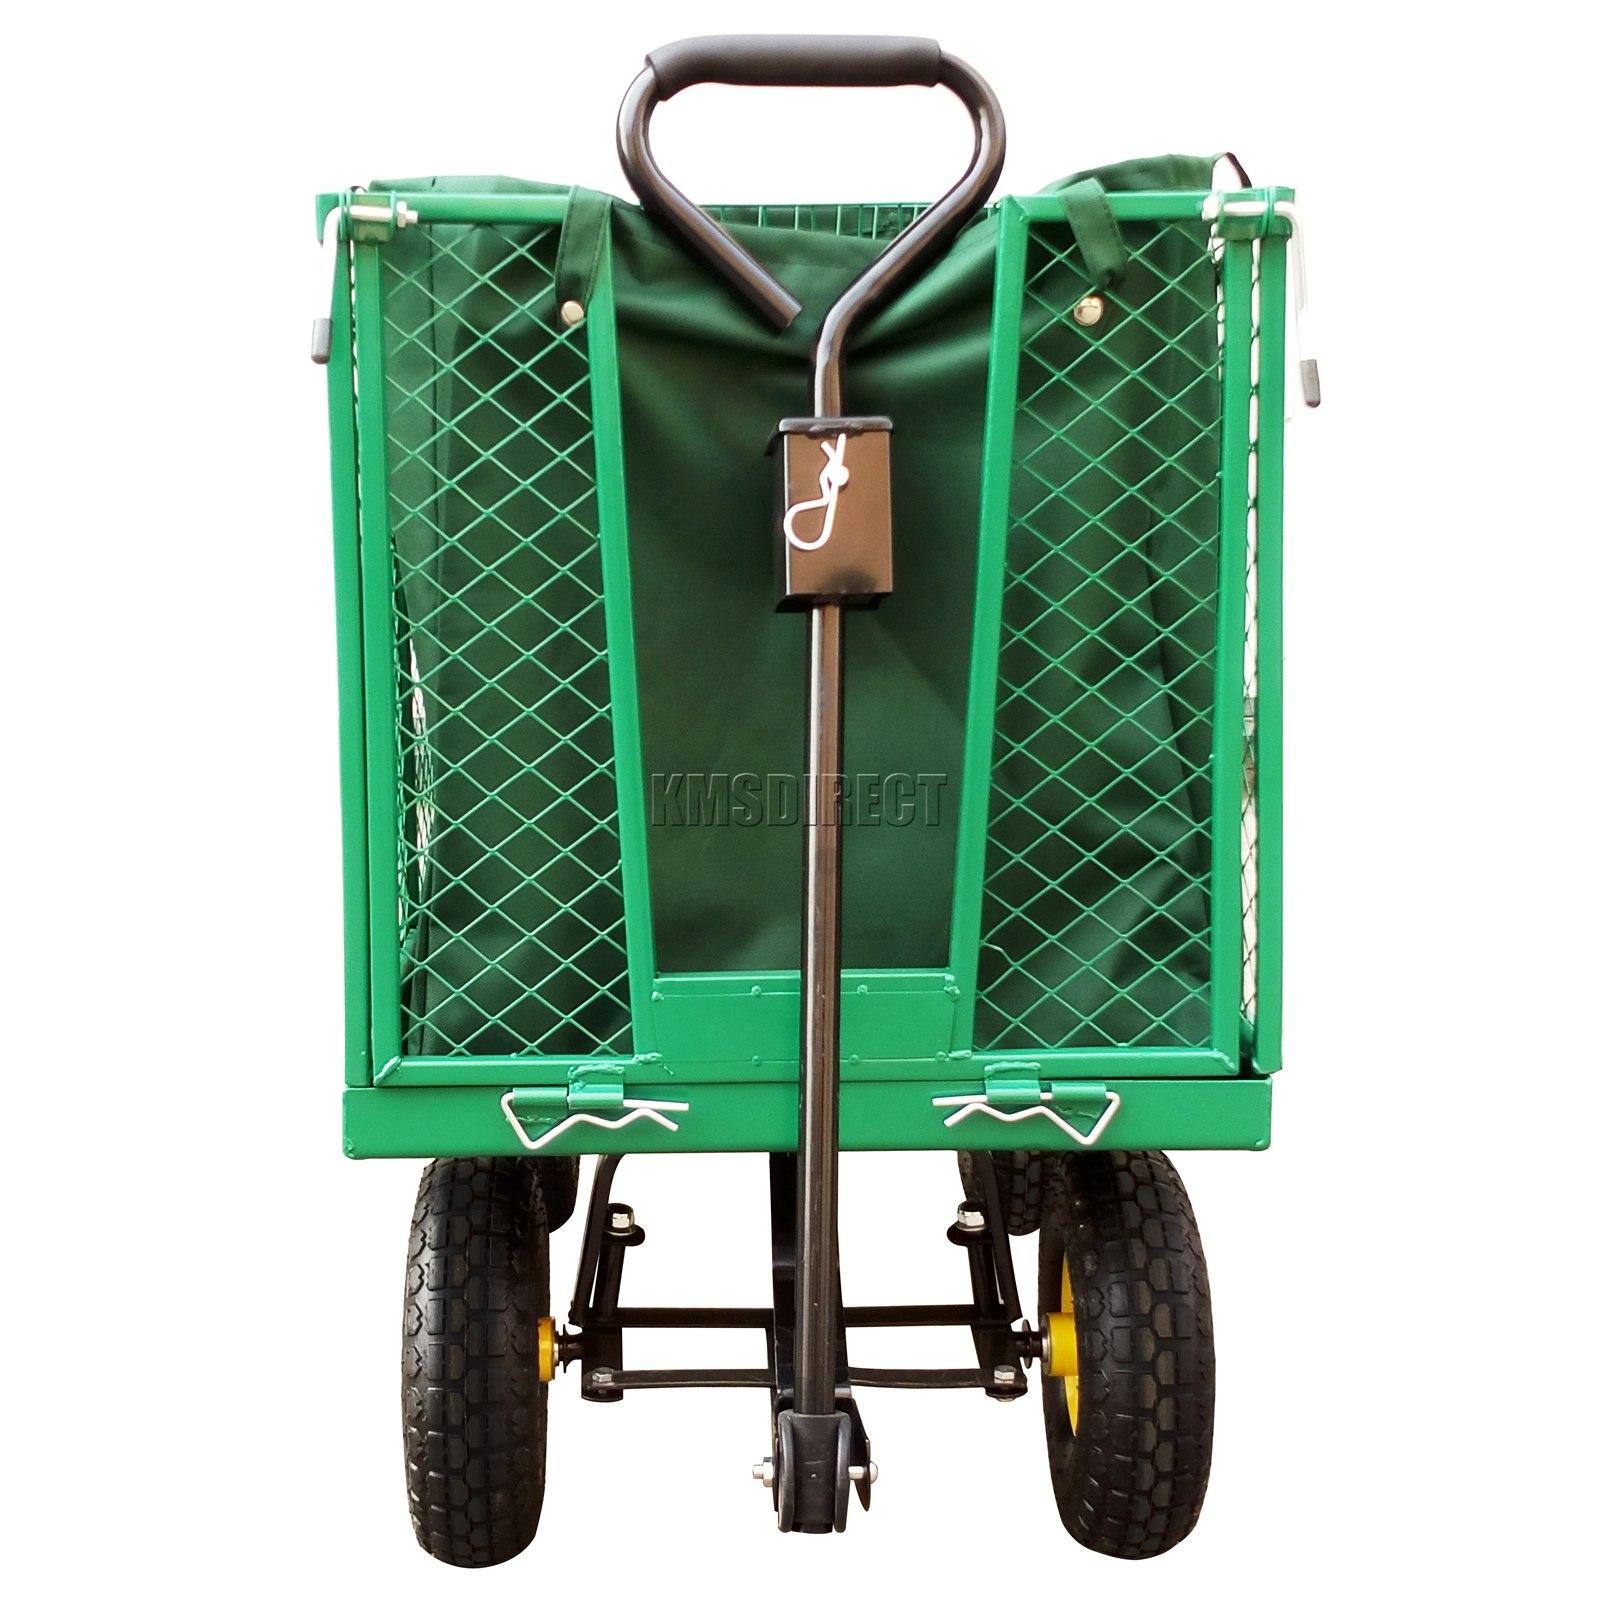 FoxHunter-Heavy-Duty-Garden-Dump-Truck-Tipping-Trailer-Trolley-Cart-Wheelbarrow miniatuur 13